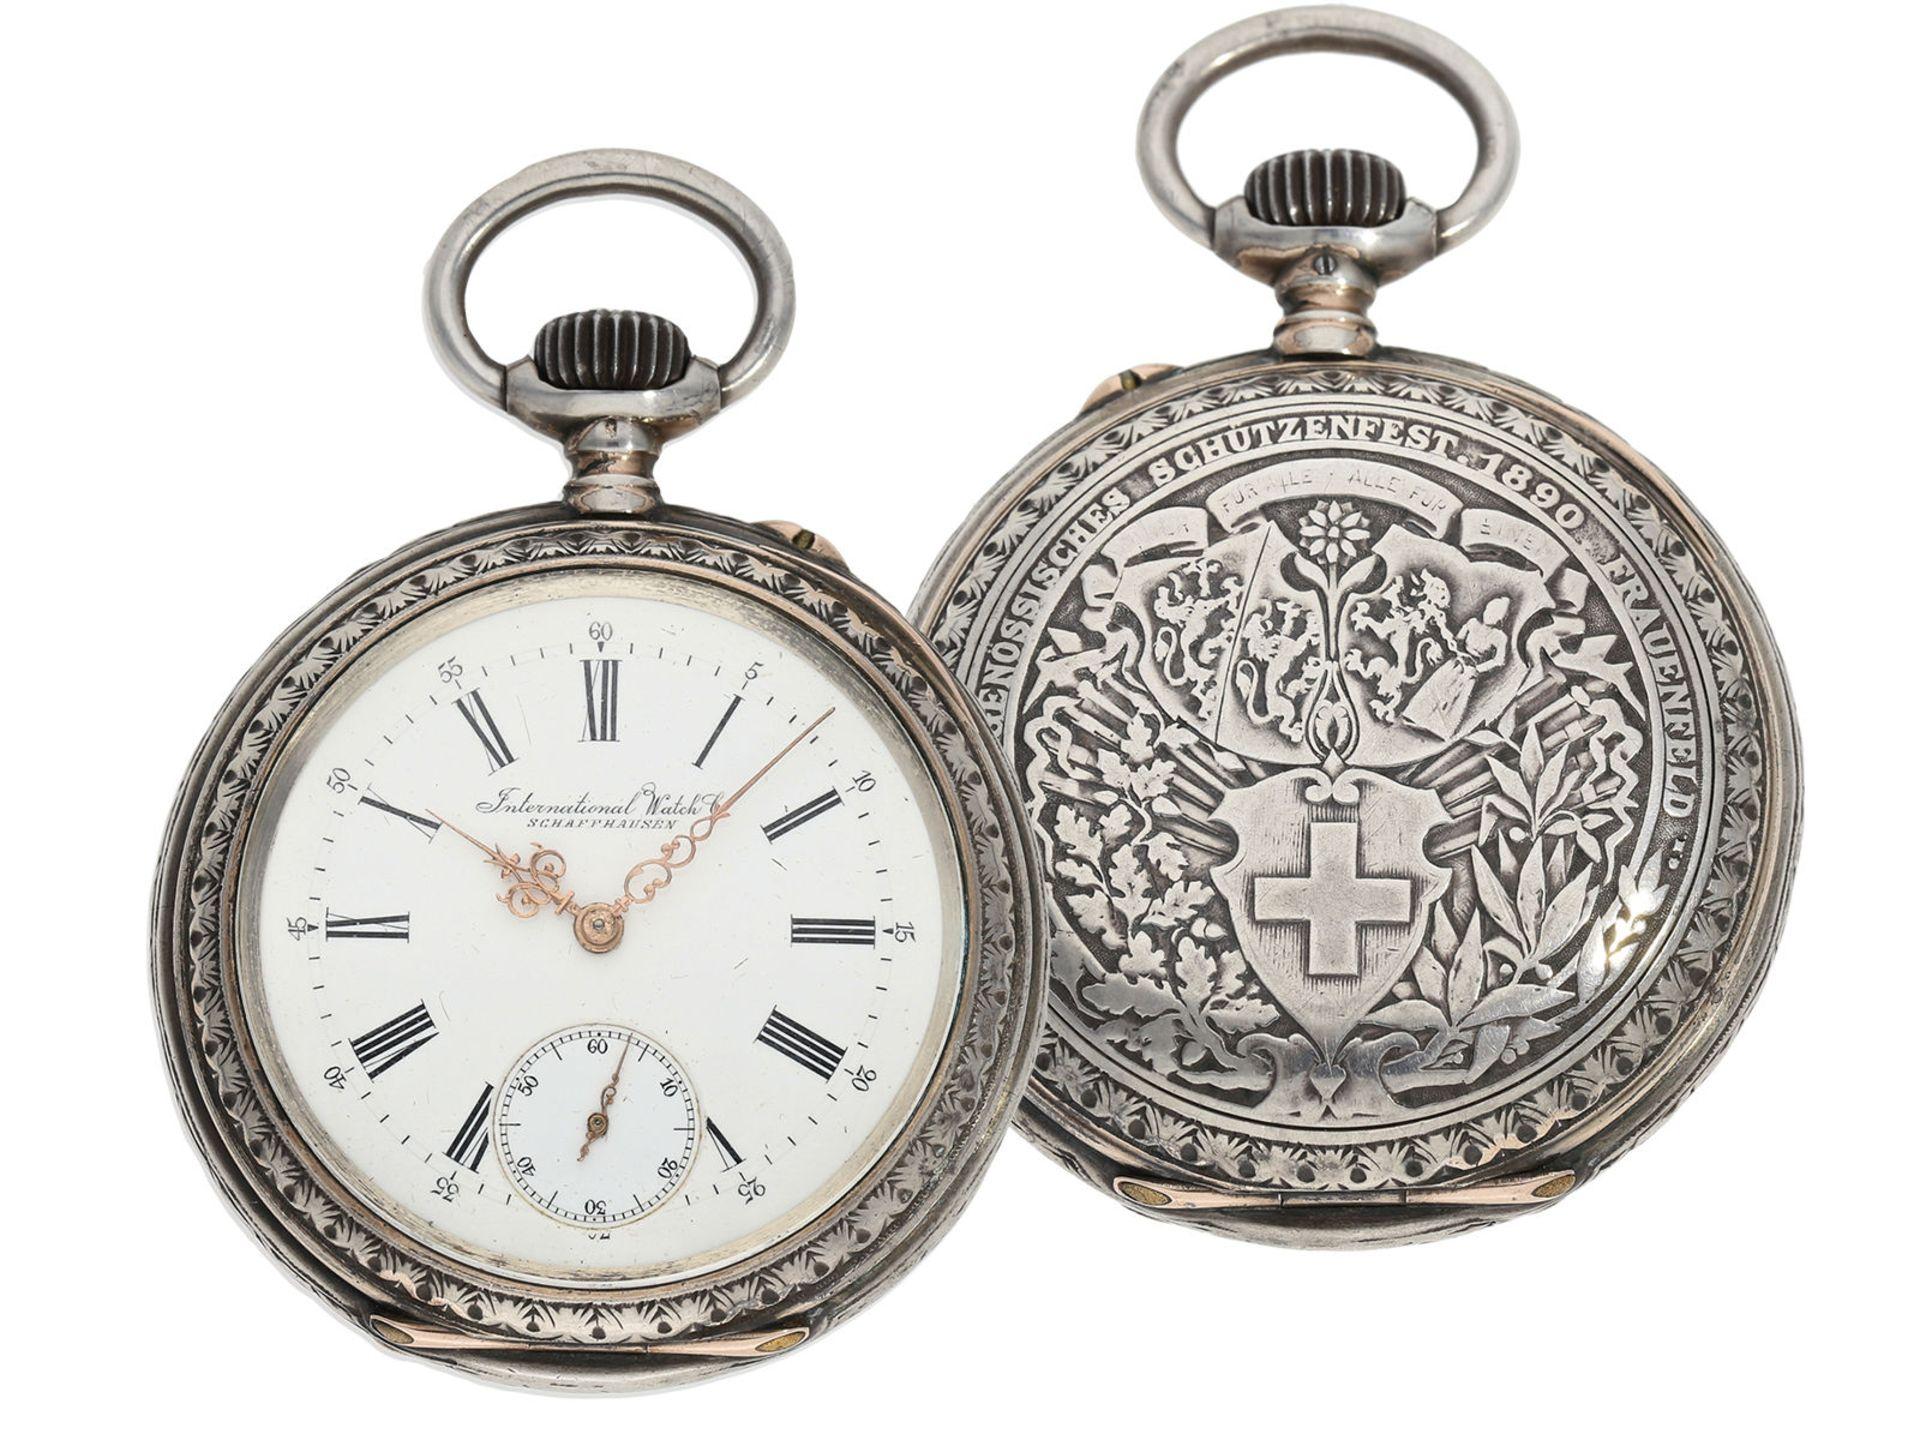 Pocket watch: large IWC marksman's watch, Federal Shooting Festival Frauenfeld 1890